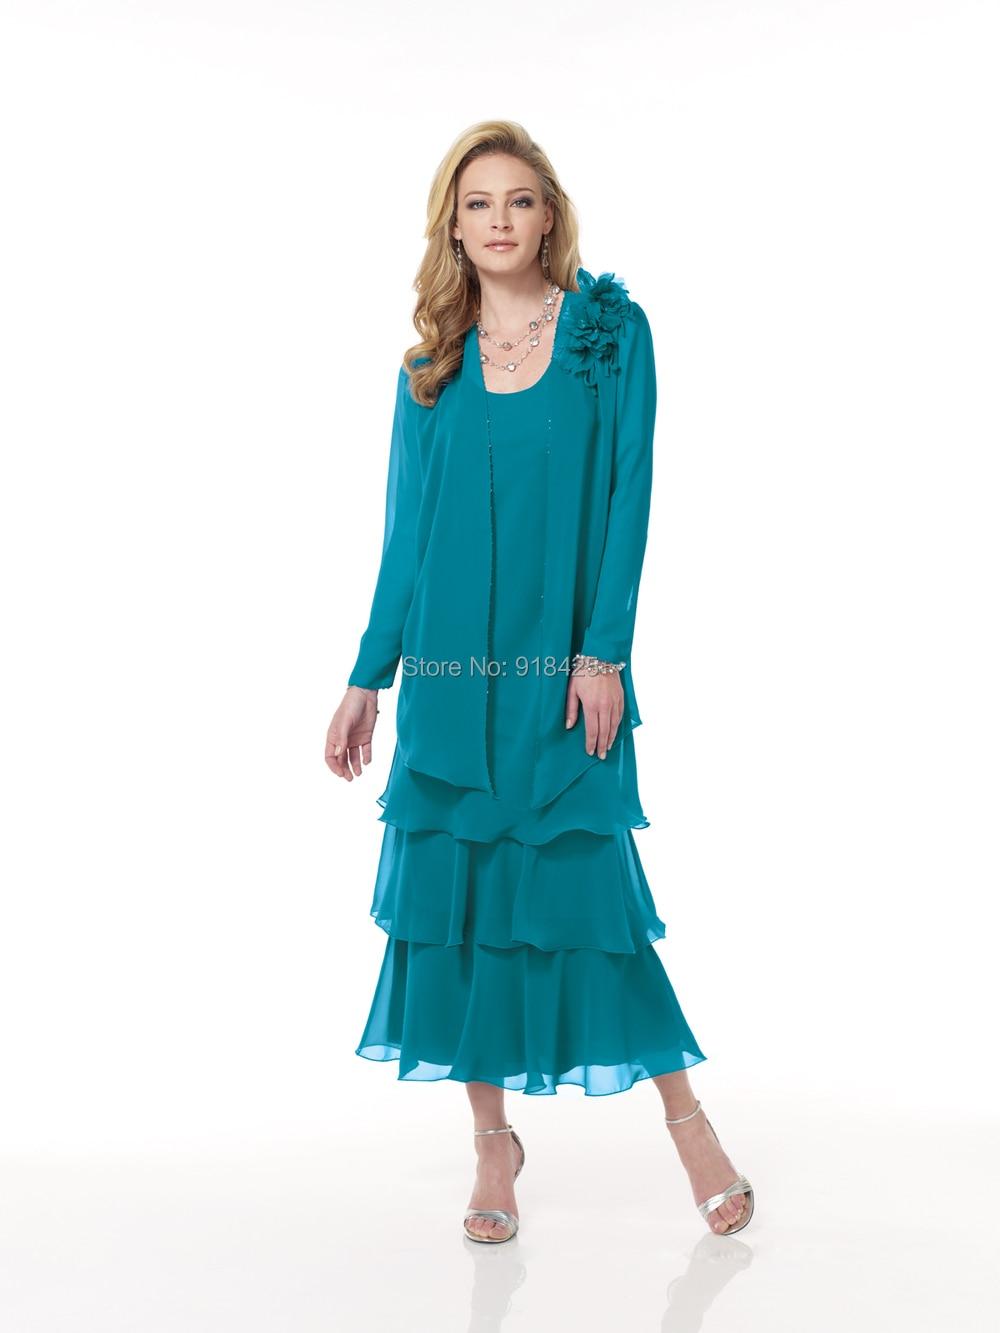 Modern Chiffon Mother Of The Bride Dresses Tea Length Pattern - All ...